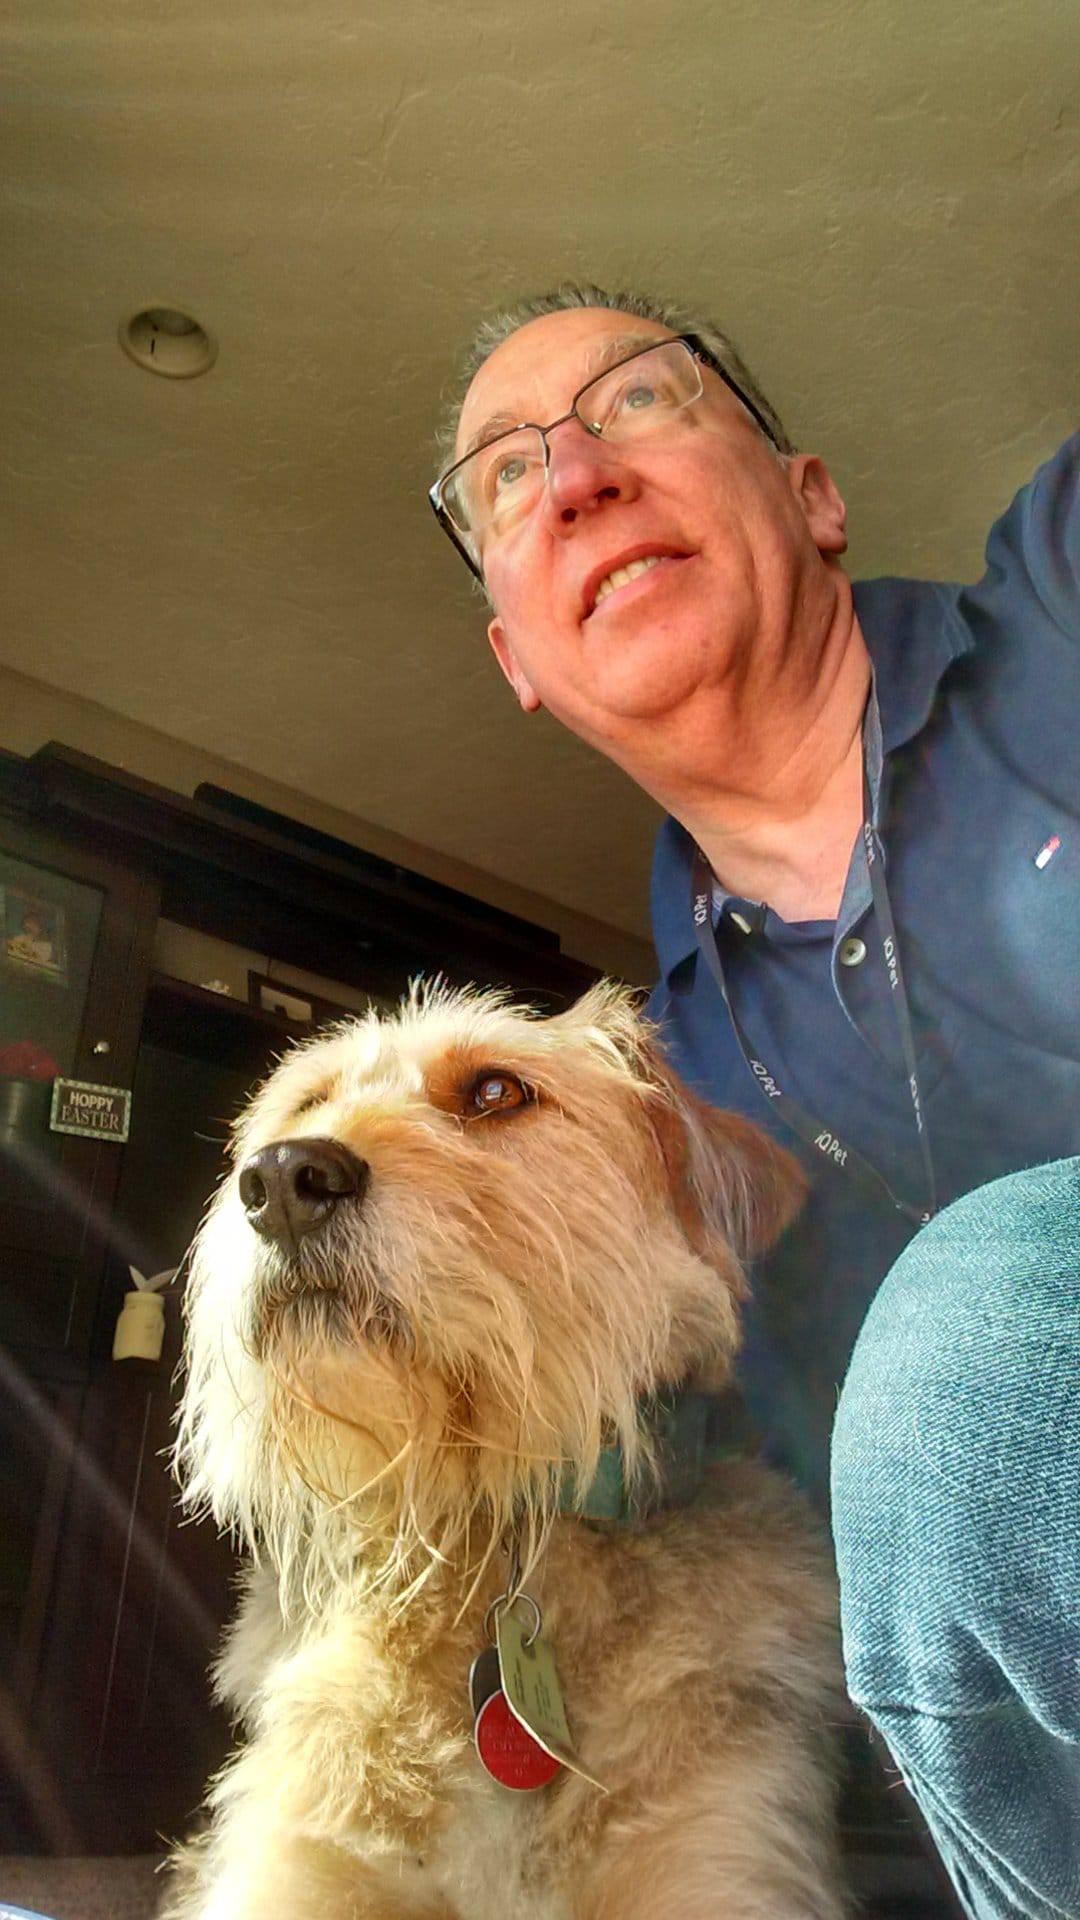 5 Franchise Opportunities For Dog Lovers